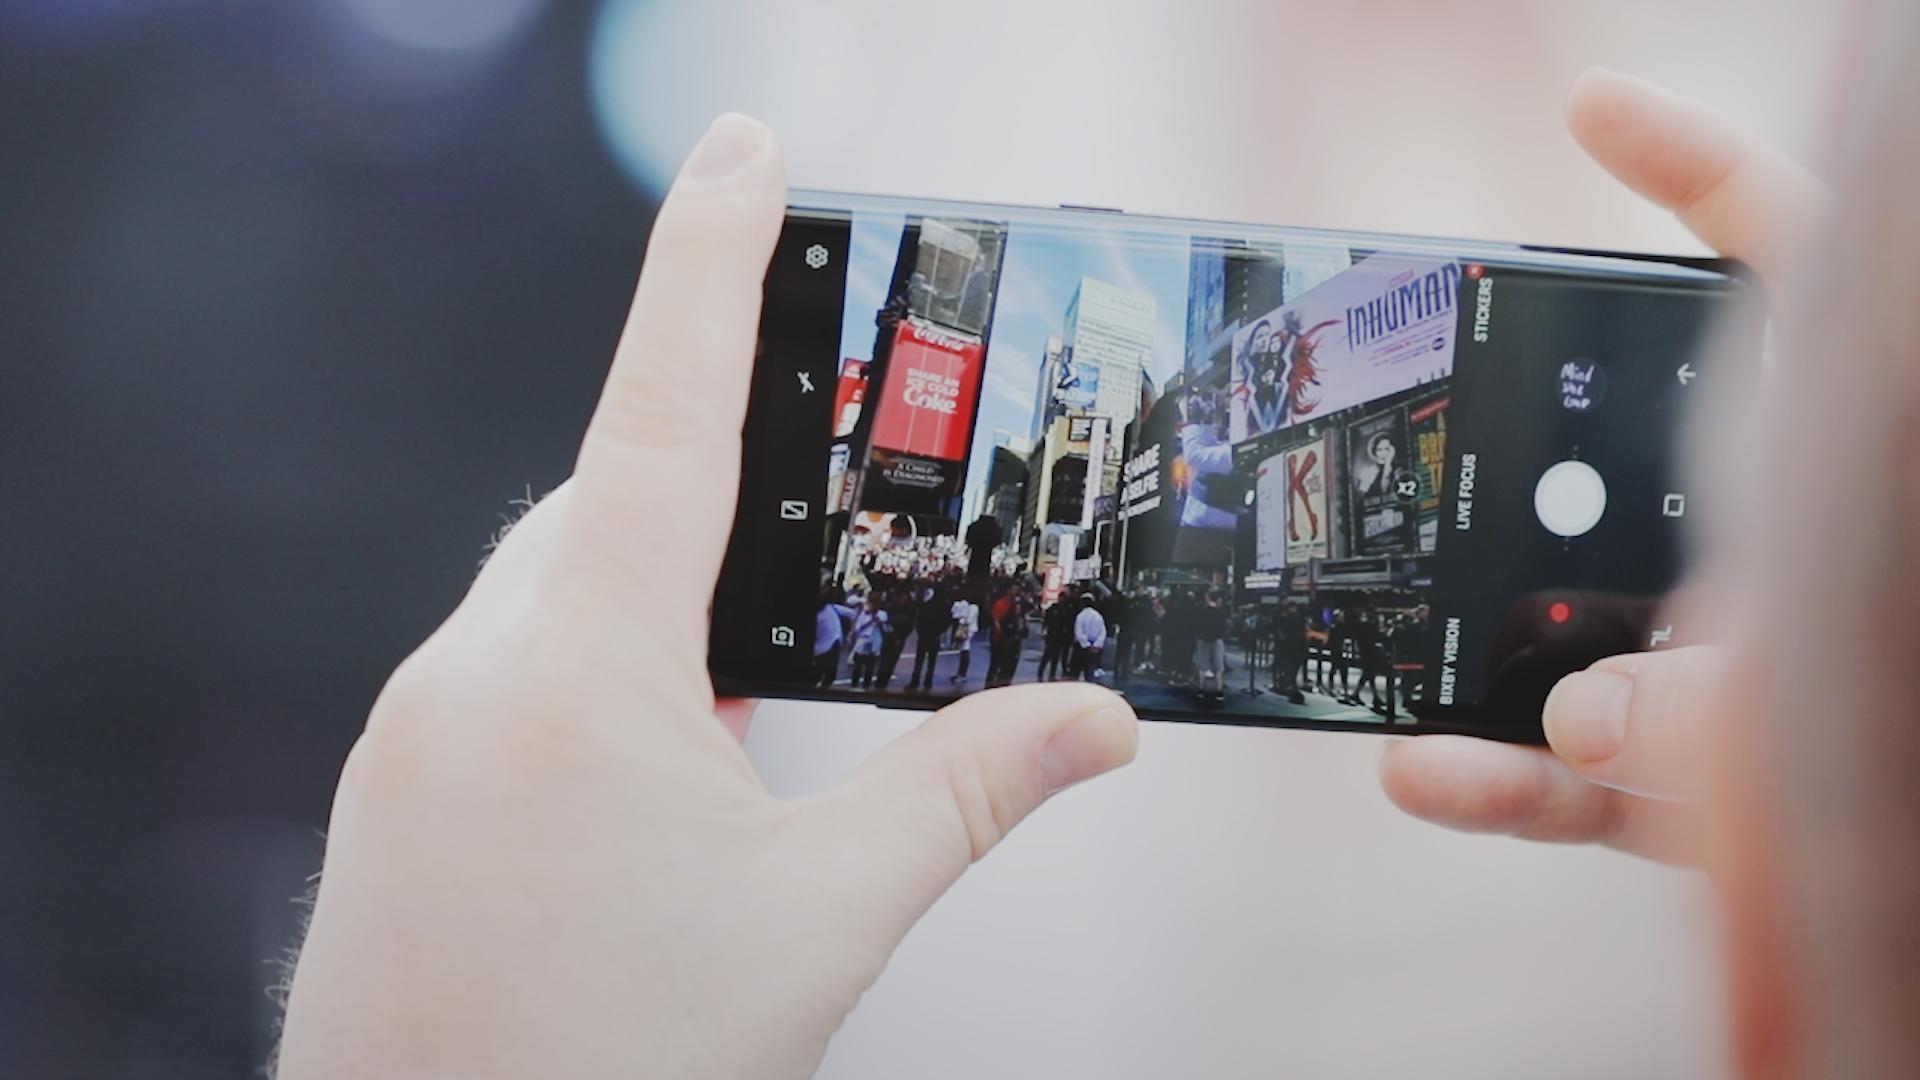 Samsung's Galaxy Note 8